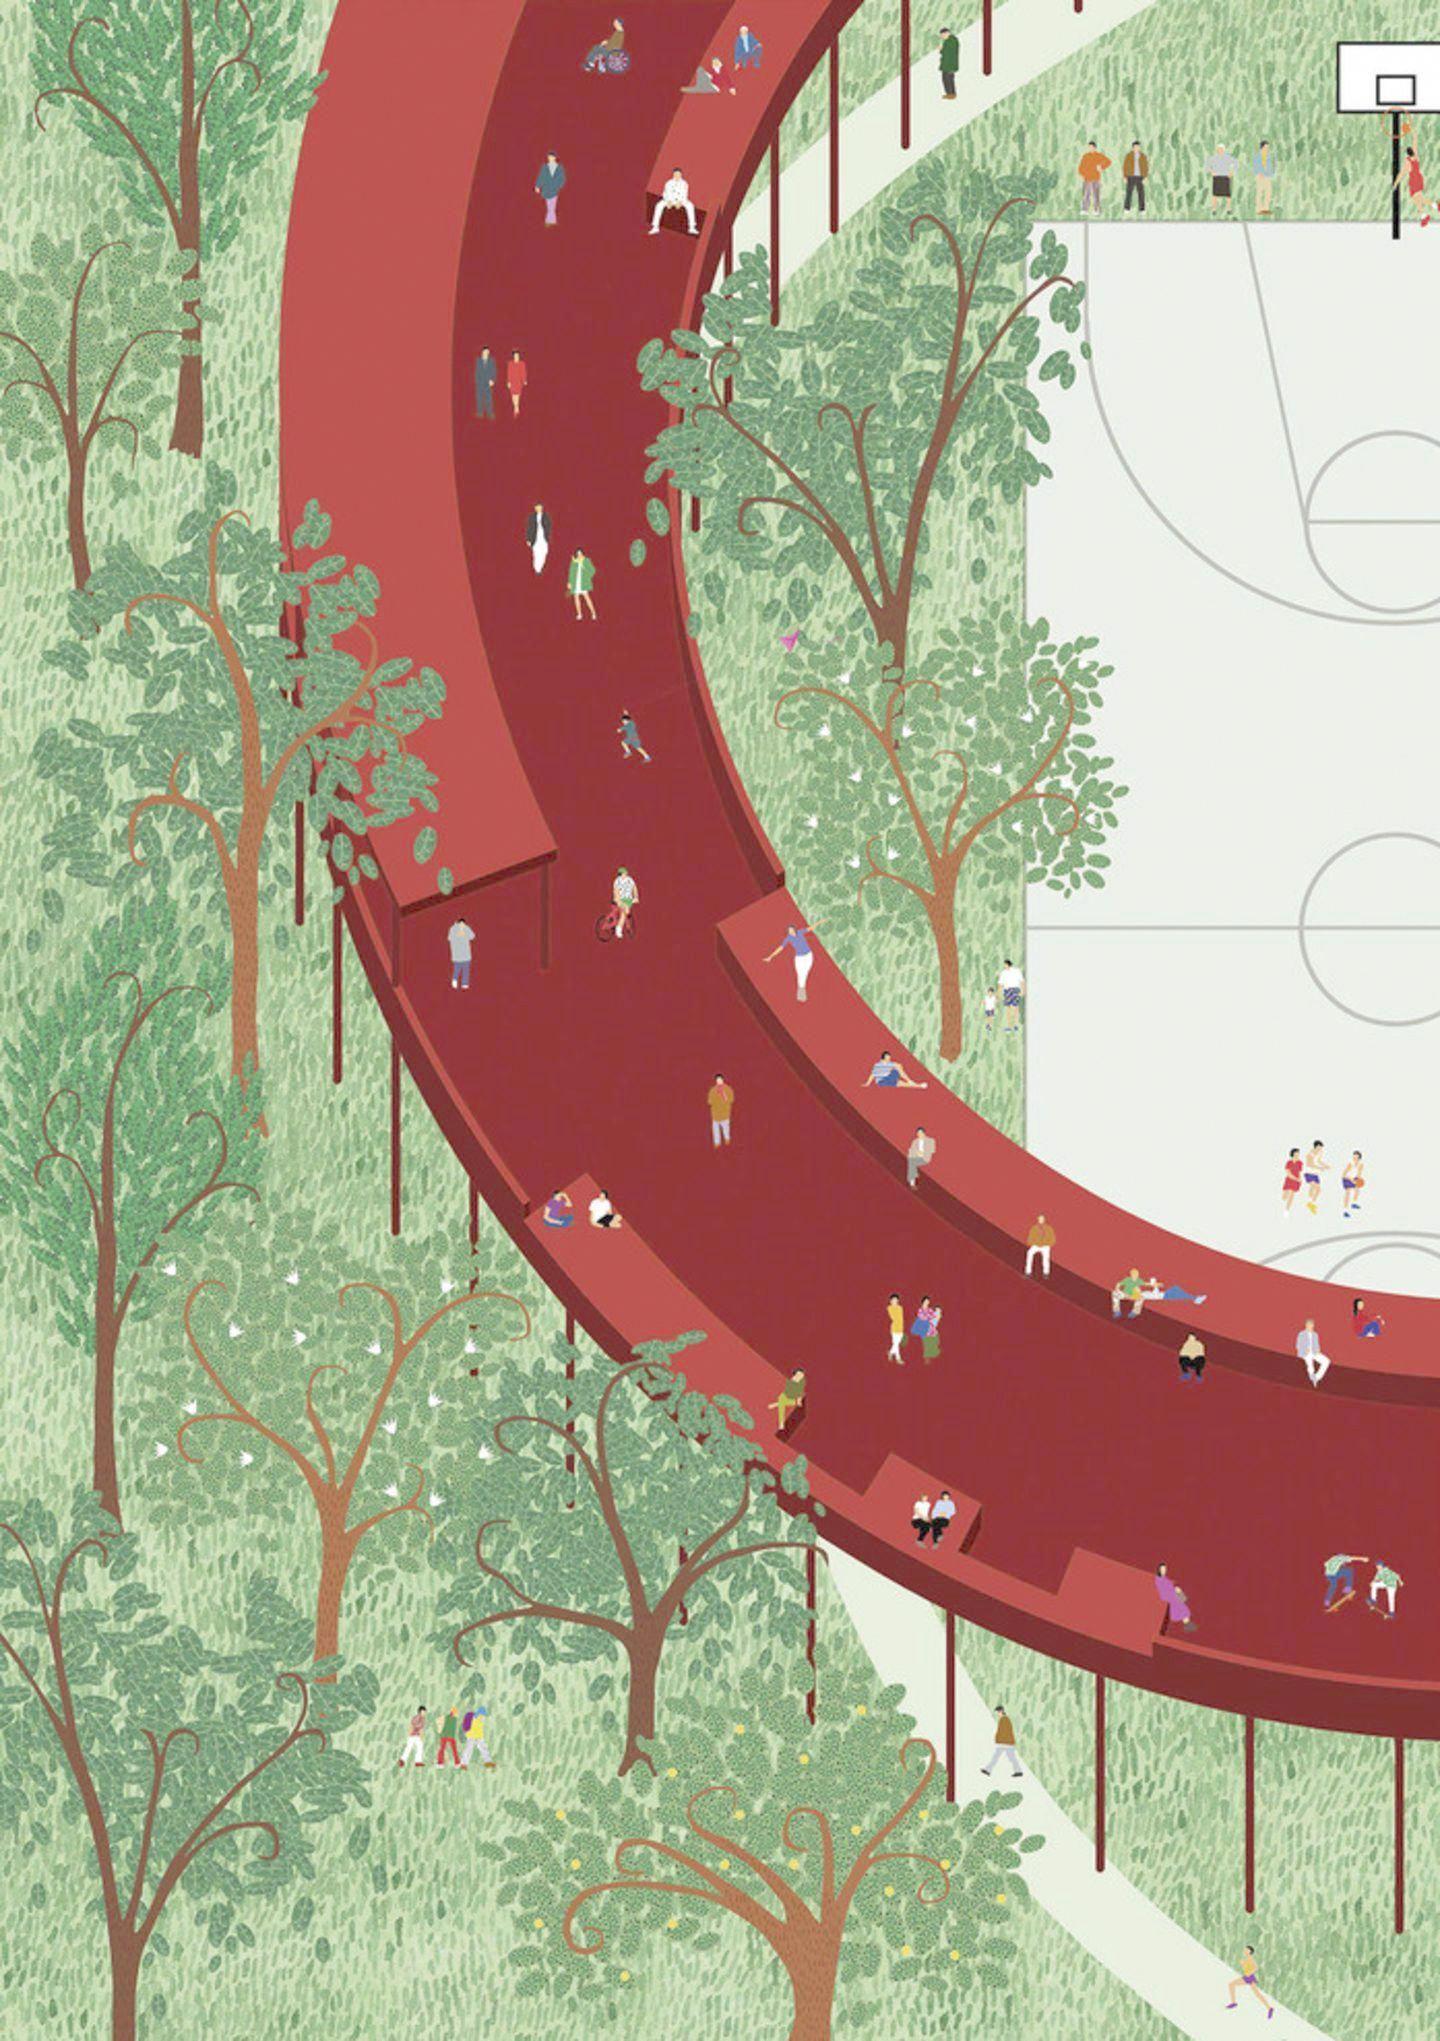 Landscape Gardening Ppt Near Landscape Architecture Concept Diagrams And Landsca L In 2020 Architecture Concept Diagram Architecture Drawing Architecture Collage